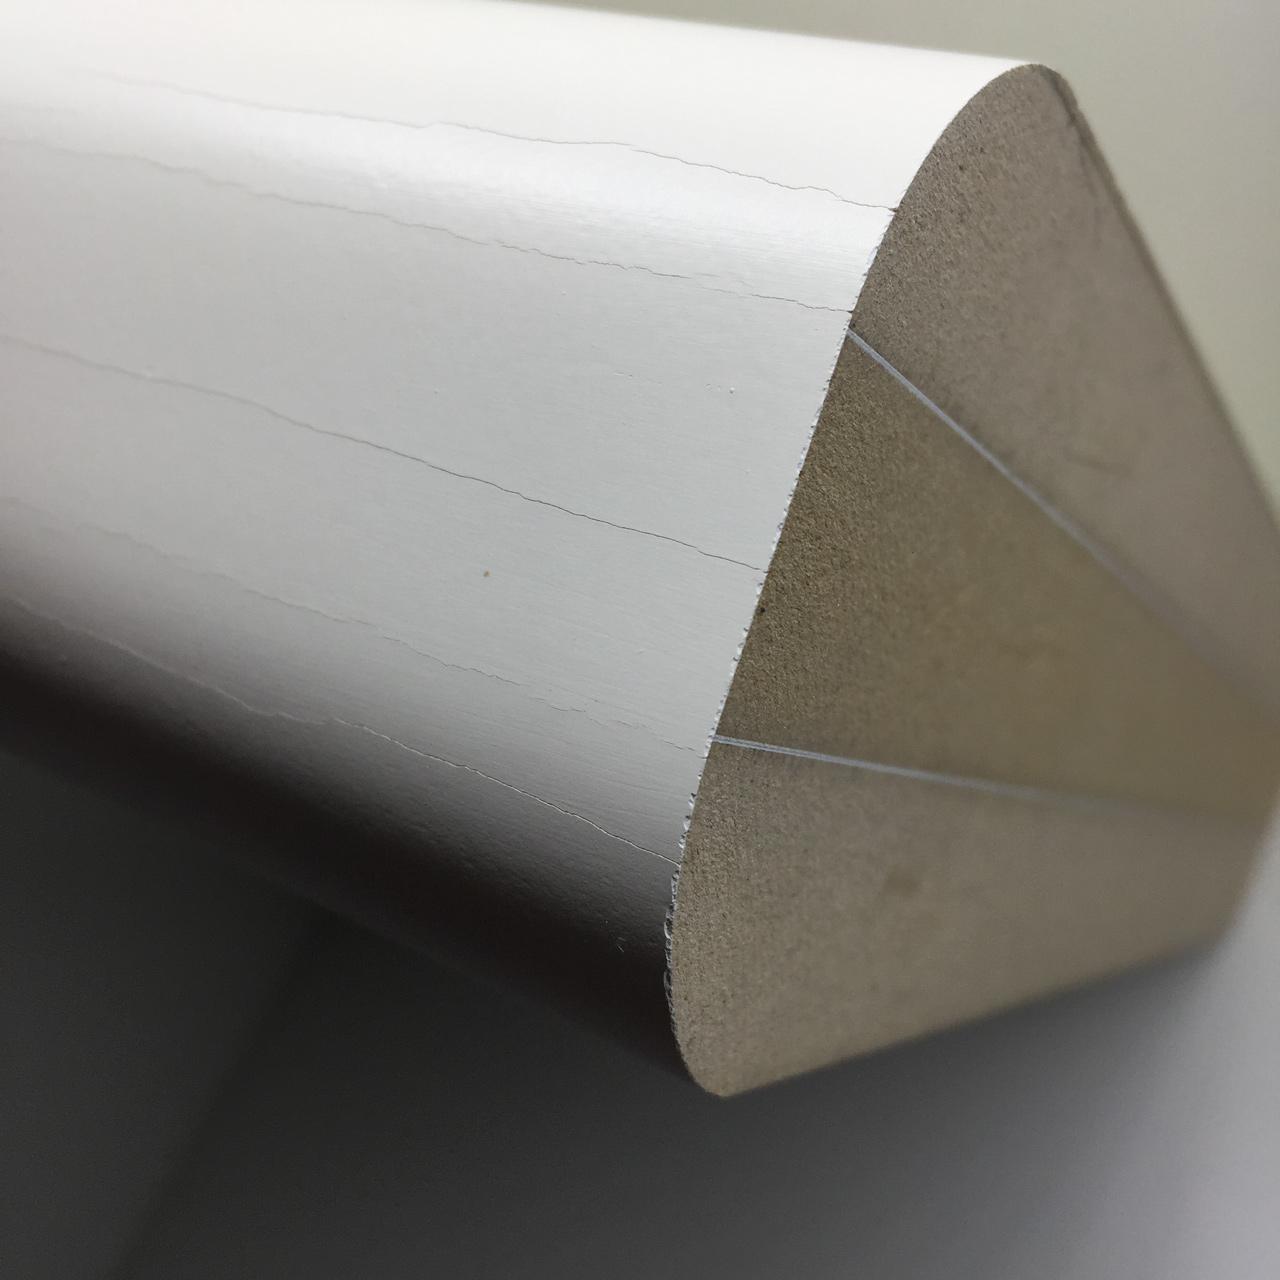 richtig lackieren: multiplex mpx furnier-platte furniersperrholz